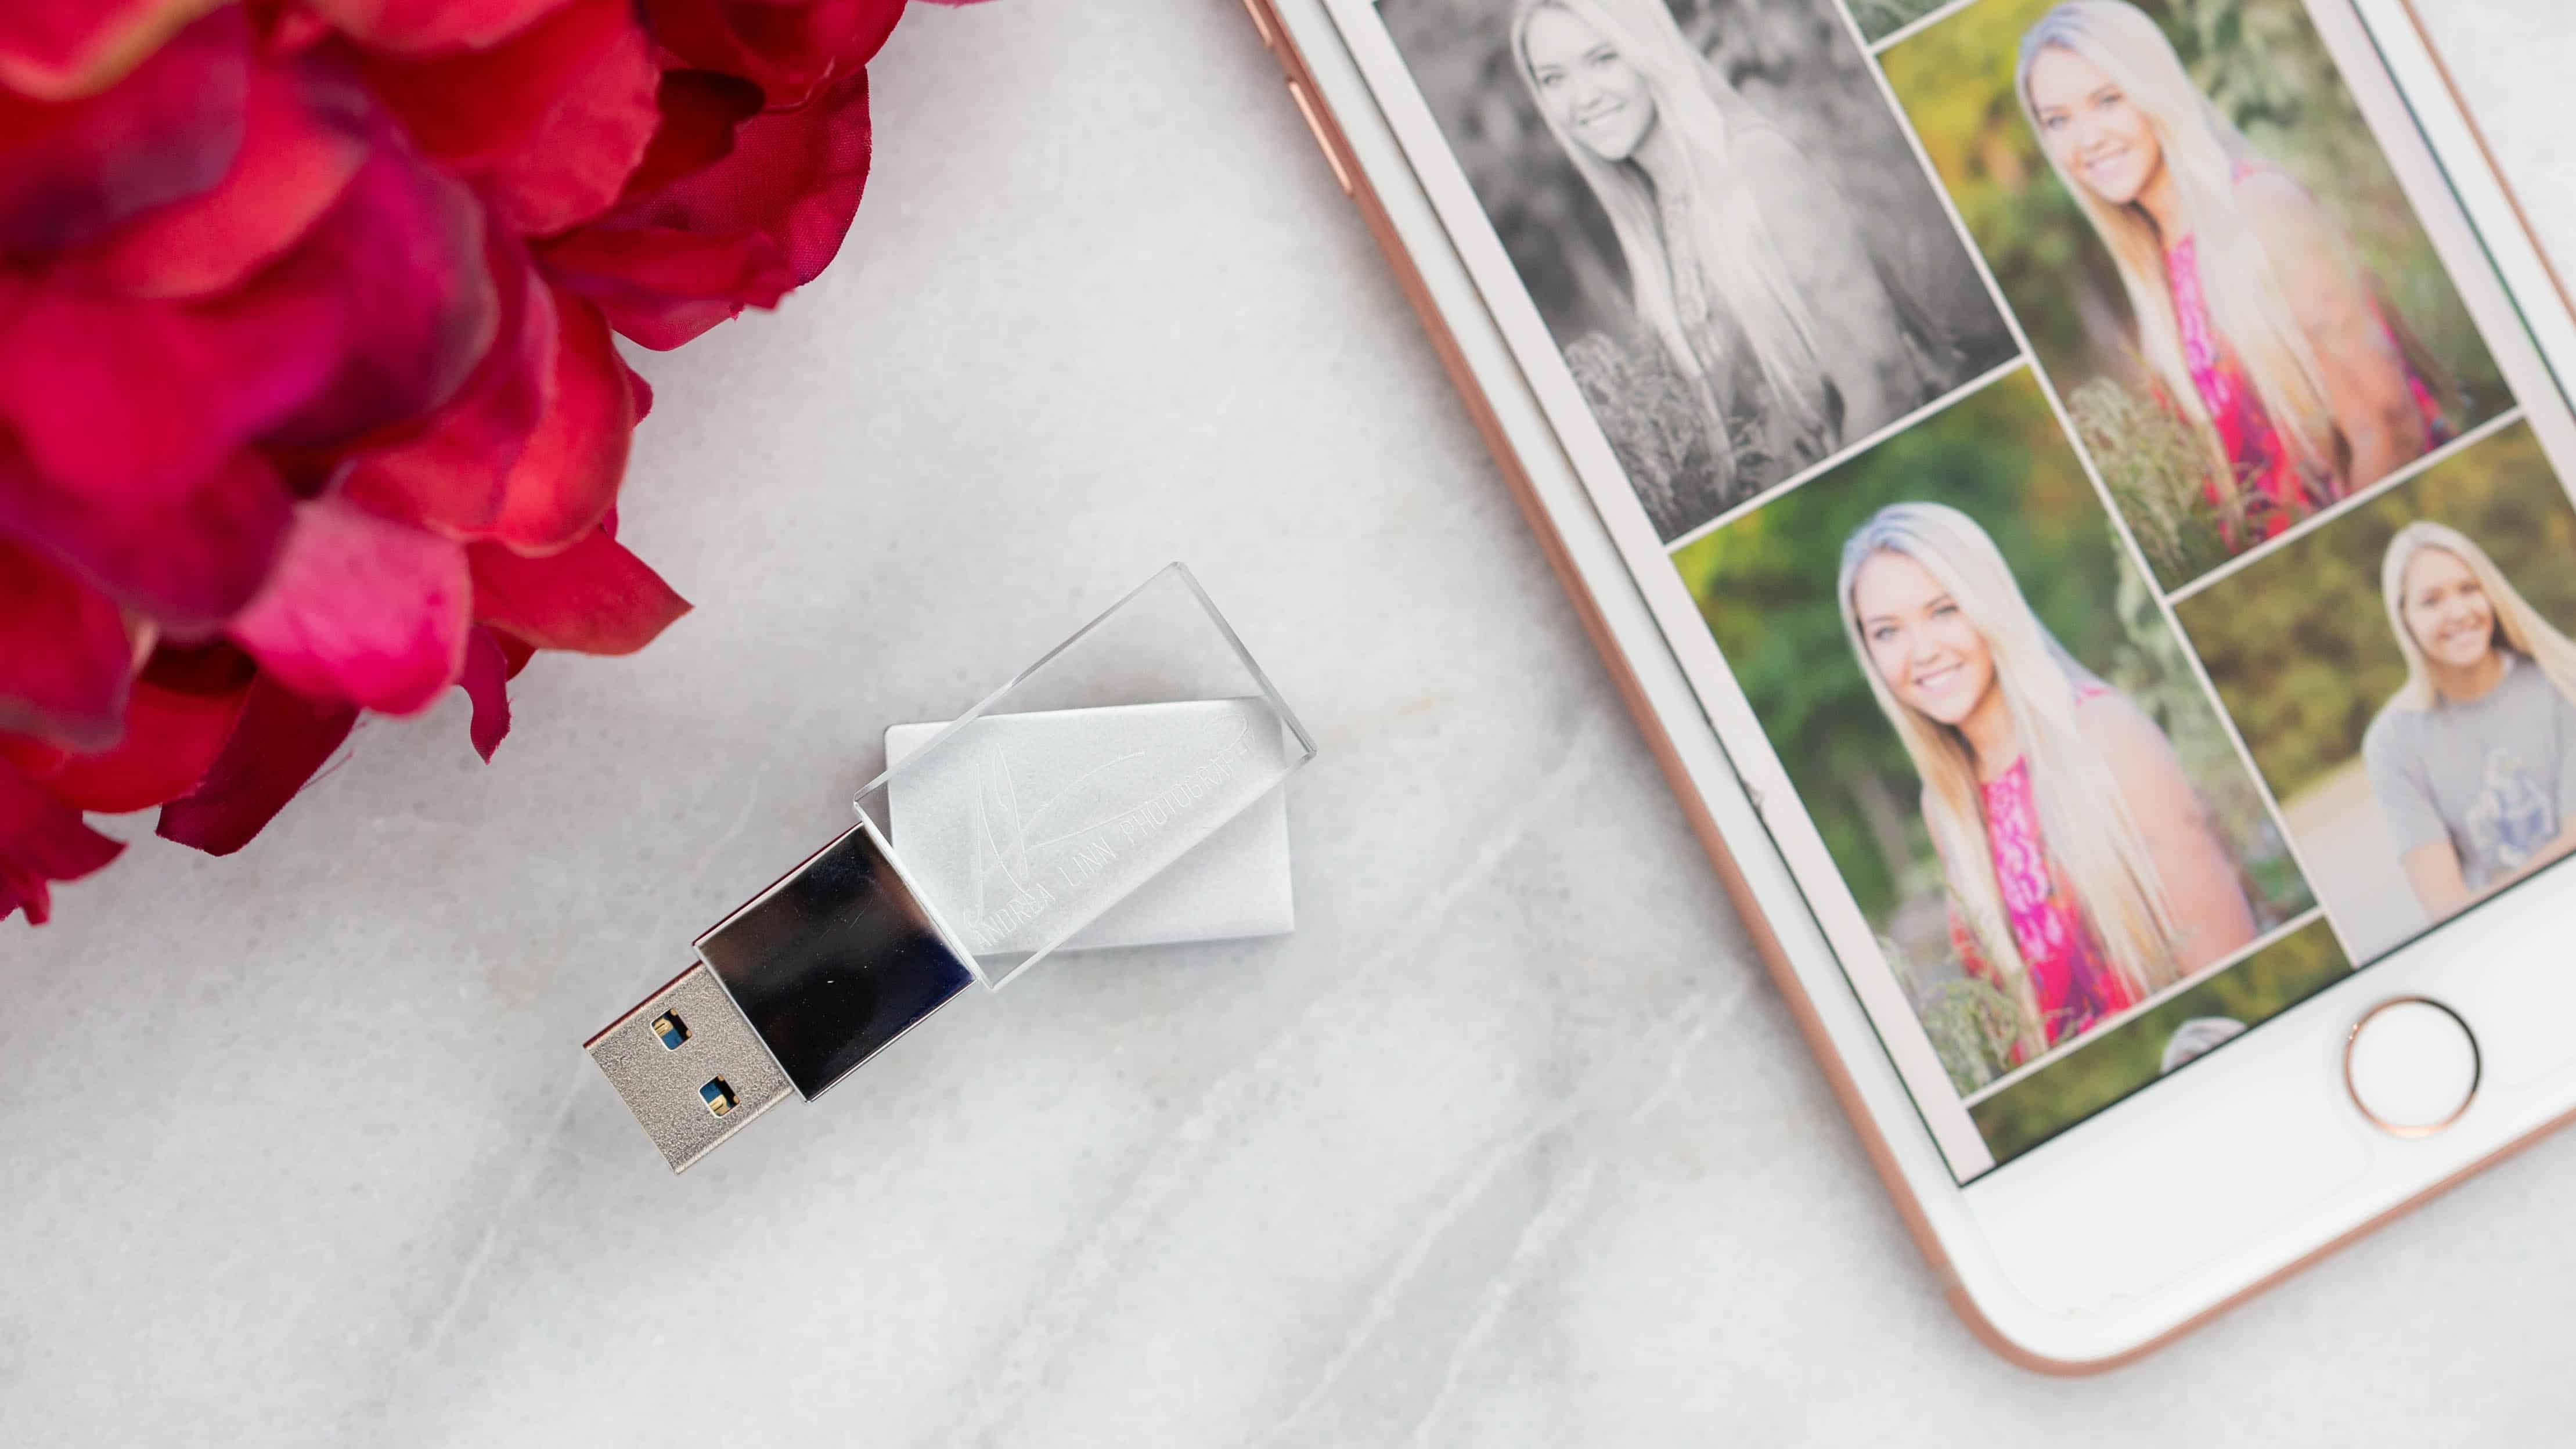 USB drive plus Online Gallery